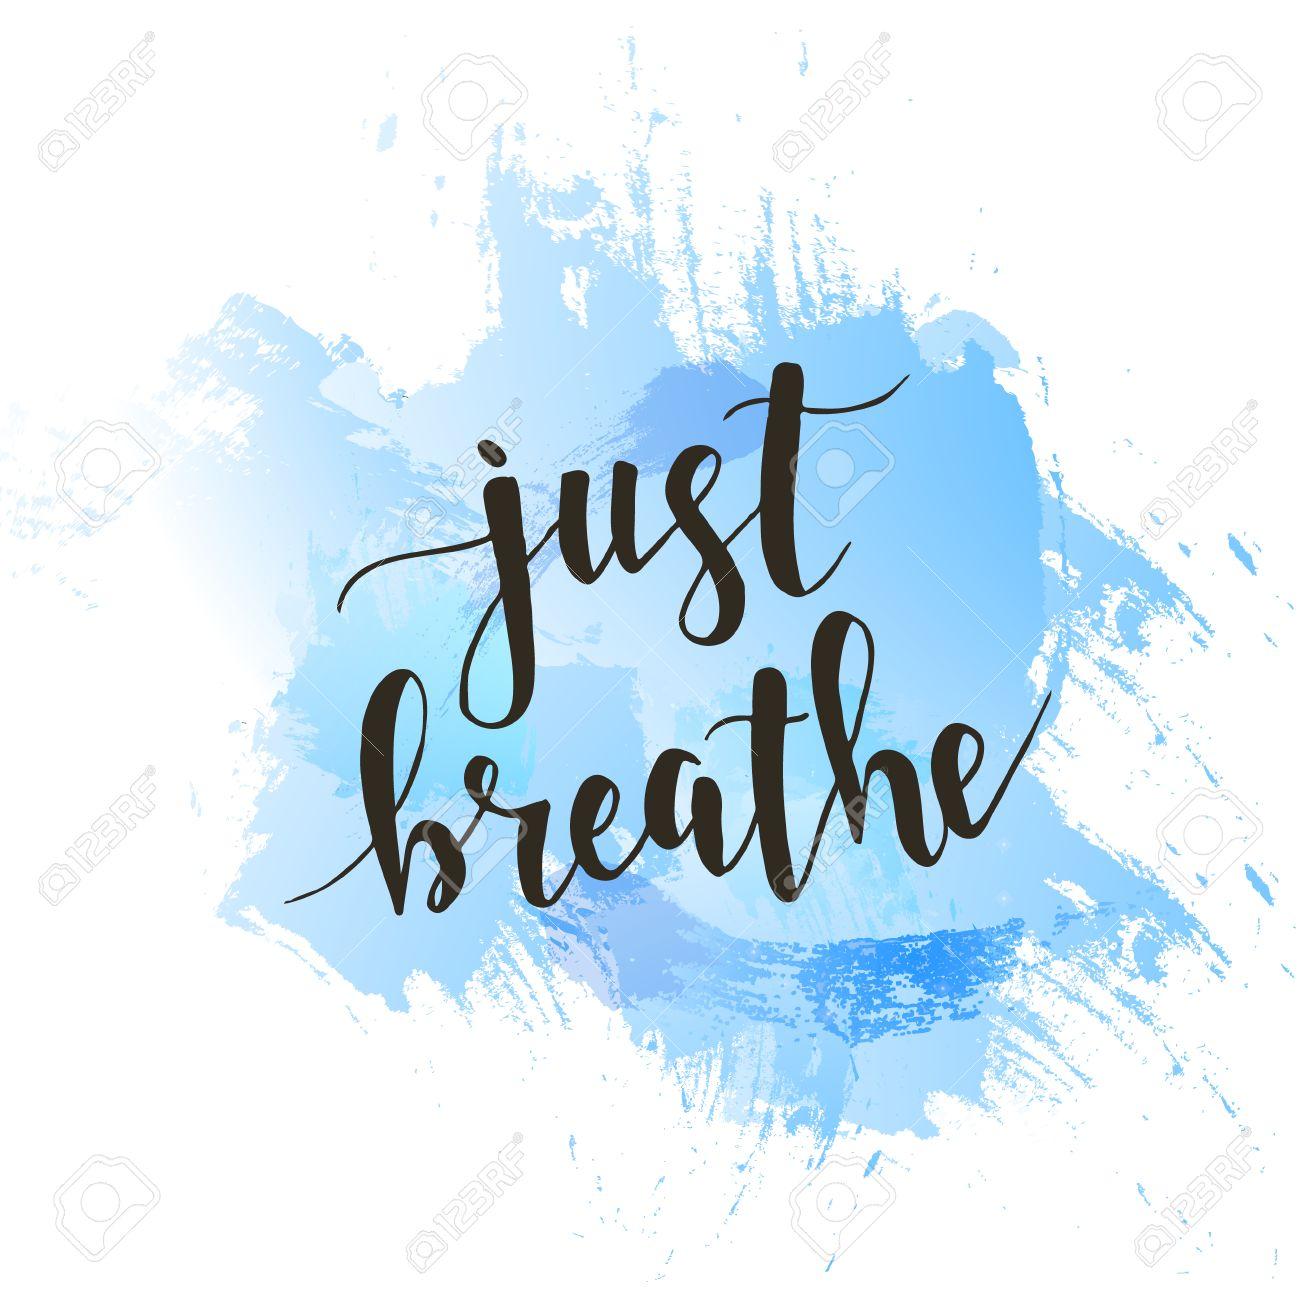 Breathe  >> Just Breathe T Shirt Hand Lettered Calligraphic Design